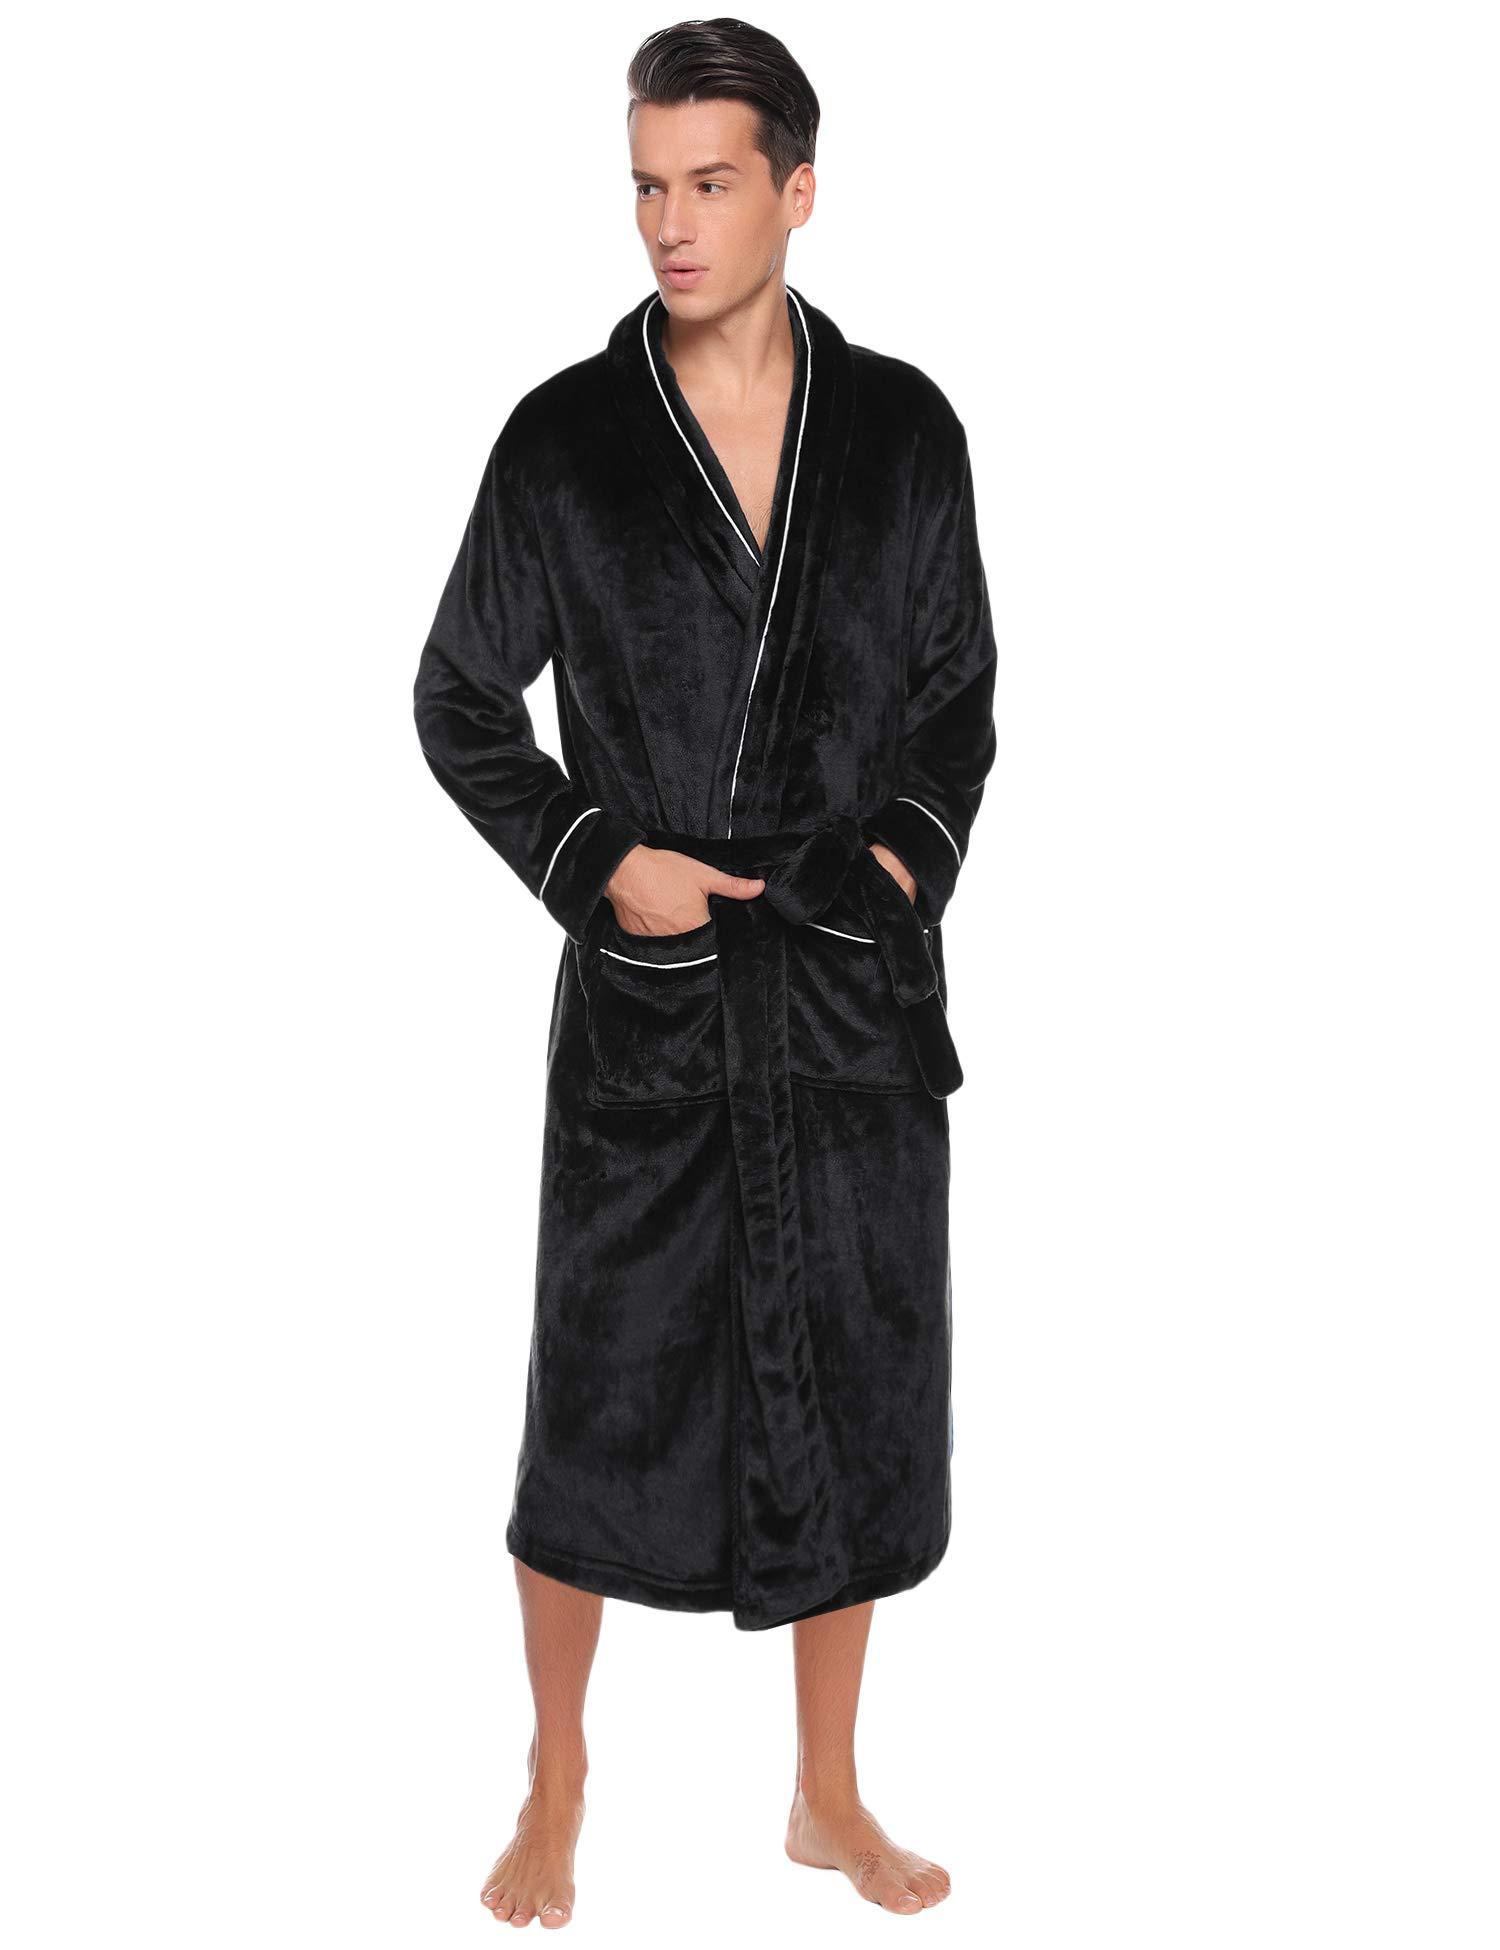 Hawiton Men's Hooded Robes - Long Plush Shawl Kimono Bathrobe Nightgown Spa Robe for Winter